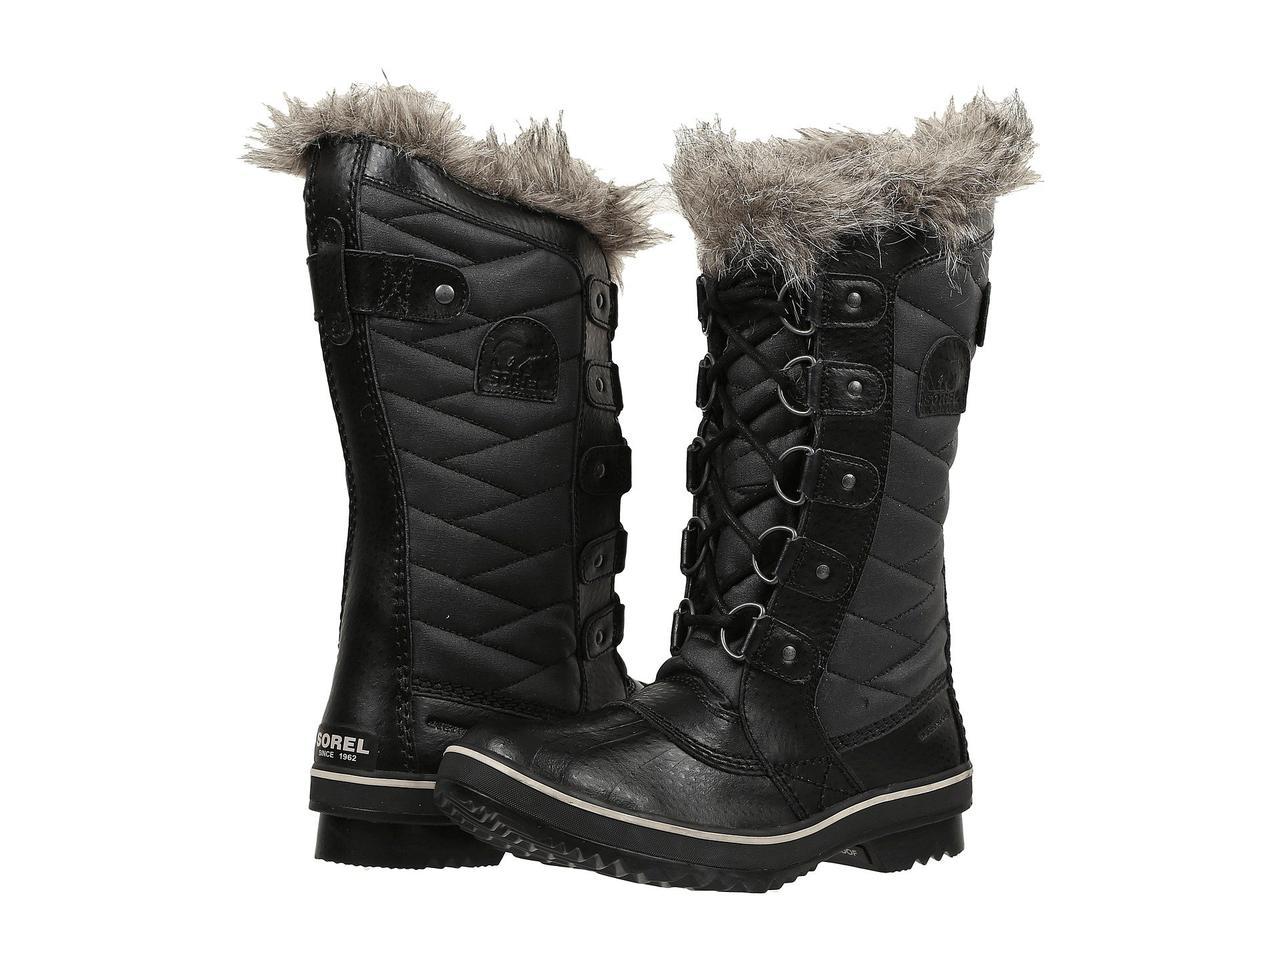 Ботинки Сапоги (Оригинал) SOREL Tofino II Black - TopUSA